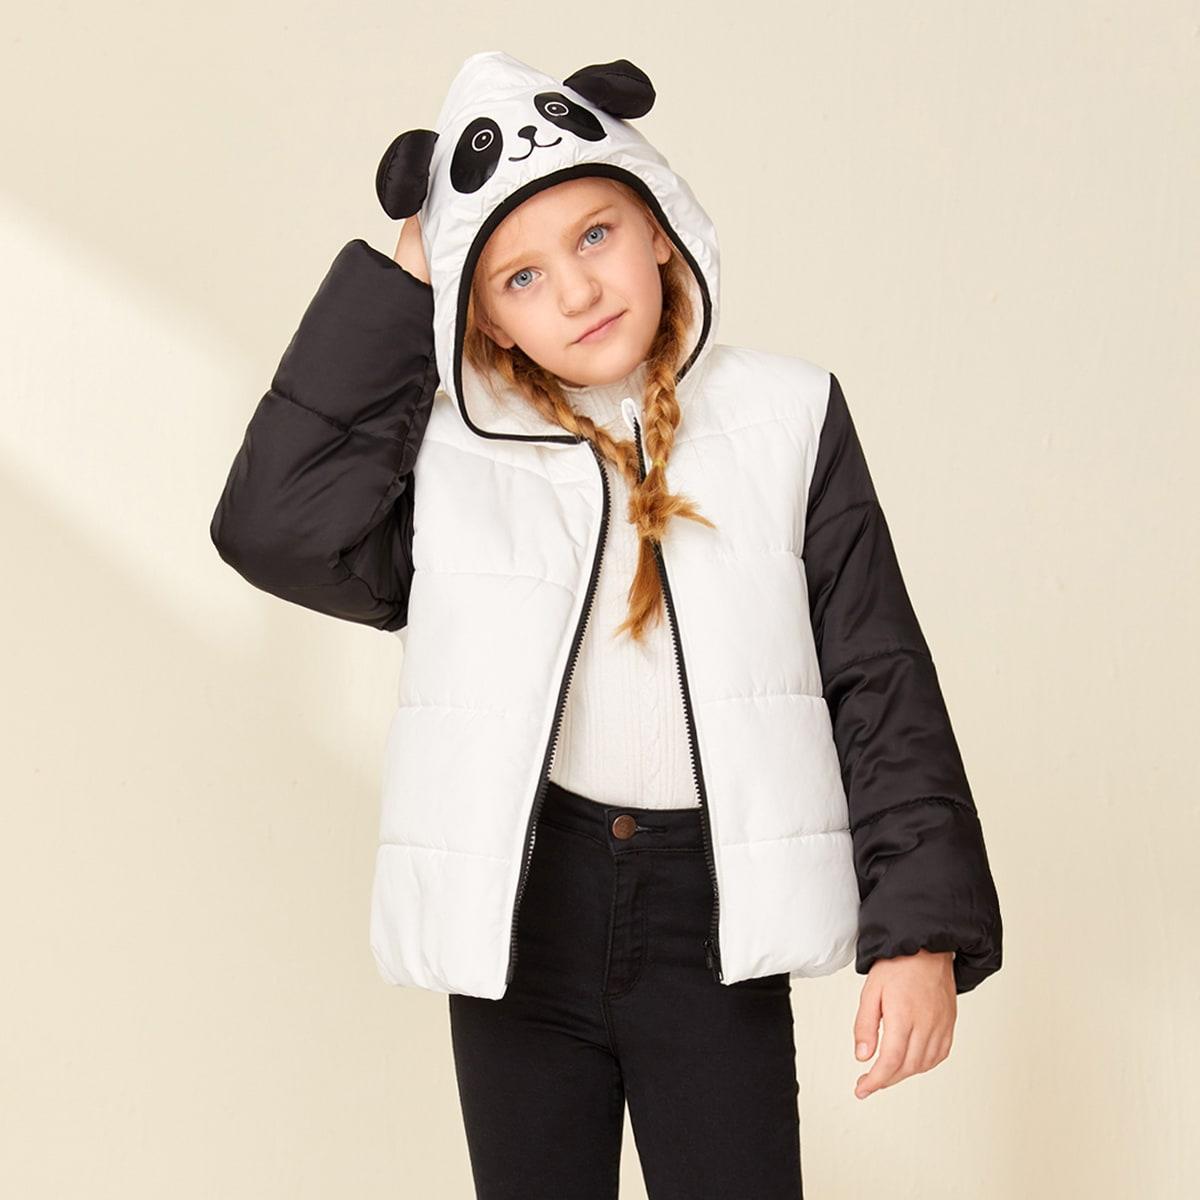 SHEIN / Girls 3D Panda Ear Design Colorblock Puffer Jacket